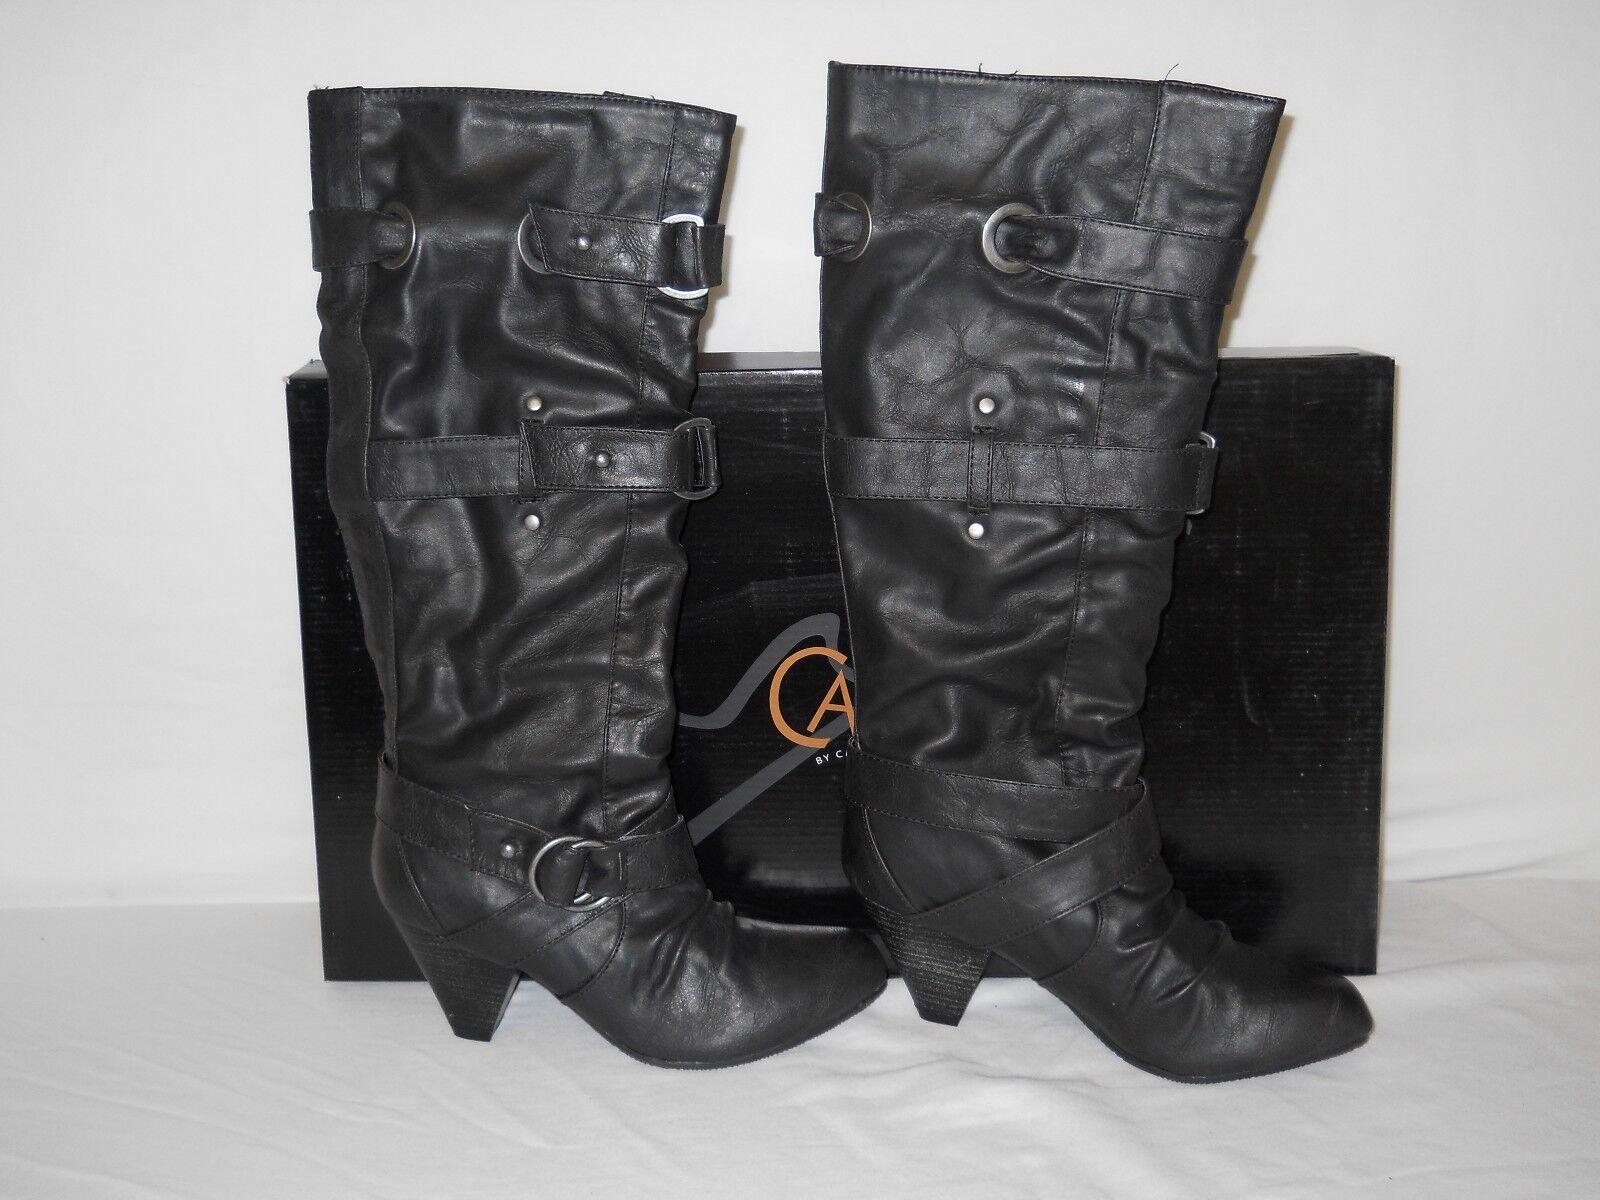 Carlos Santana New Womens Bailey Black Boots 6 M Shoes NWB